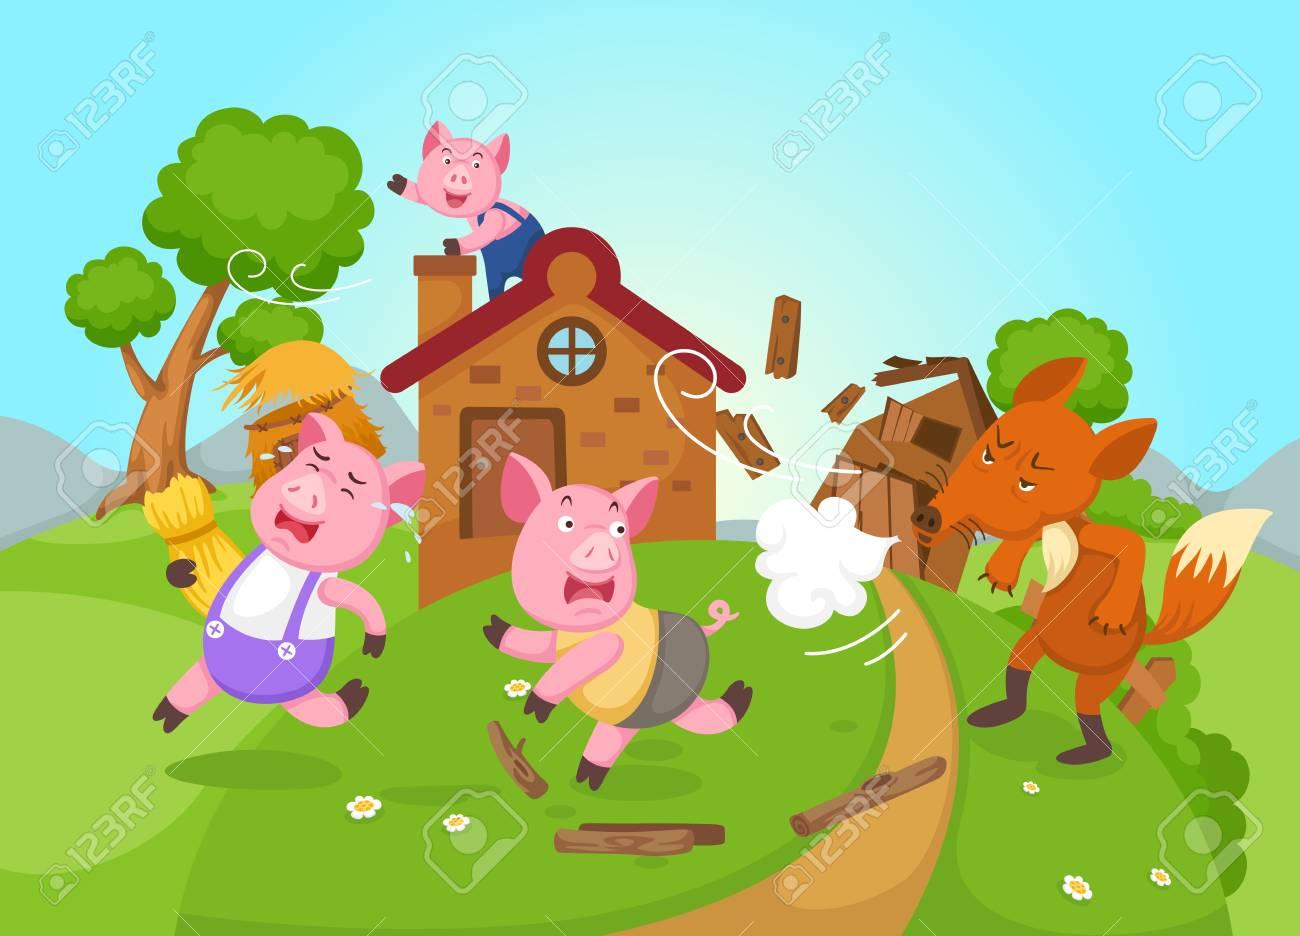 illustration of isolated fairy tale three little pigs vector - 98613306